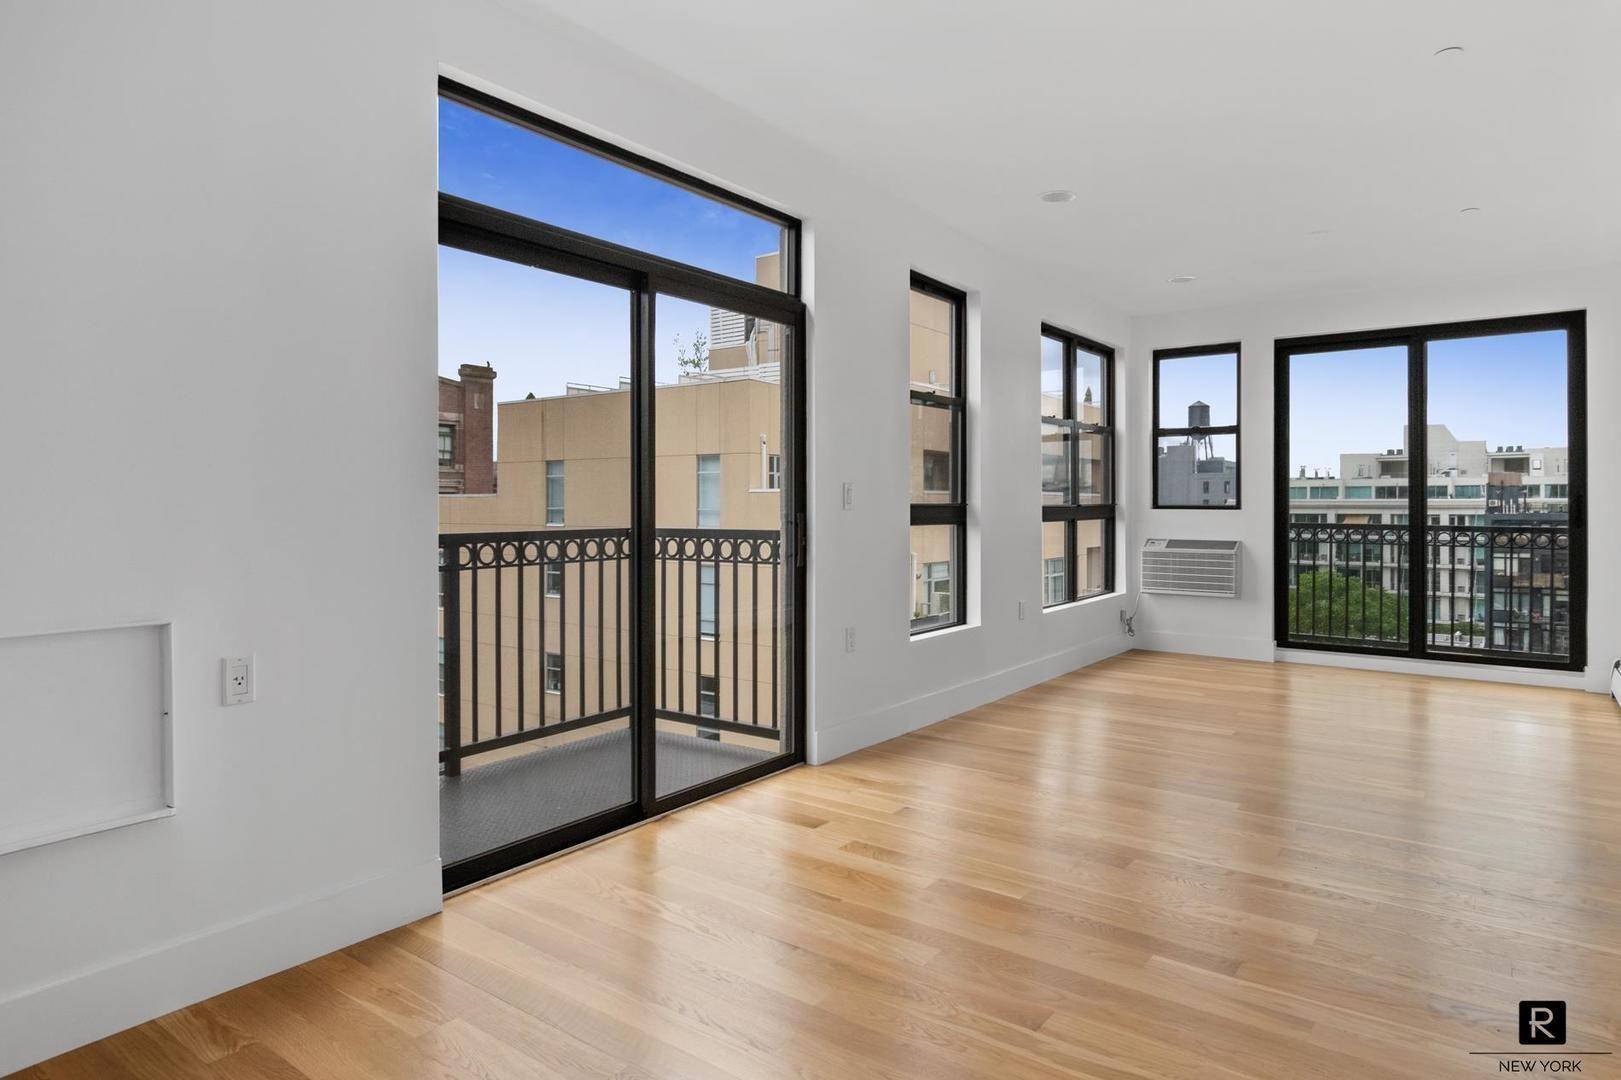 Apartment for sale at 79 Bridge Street, Apt 6-F